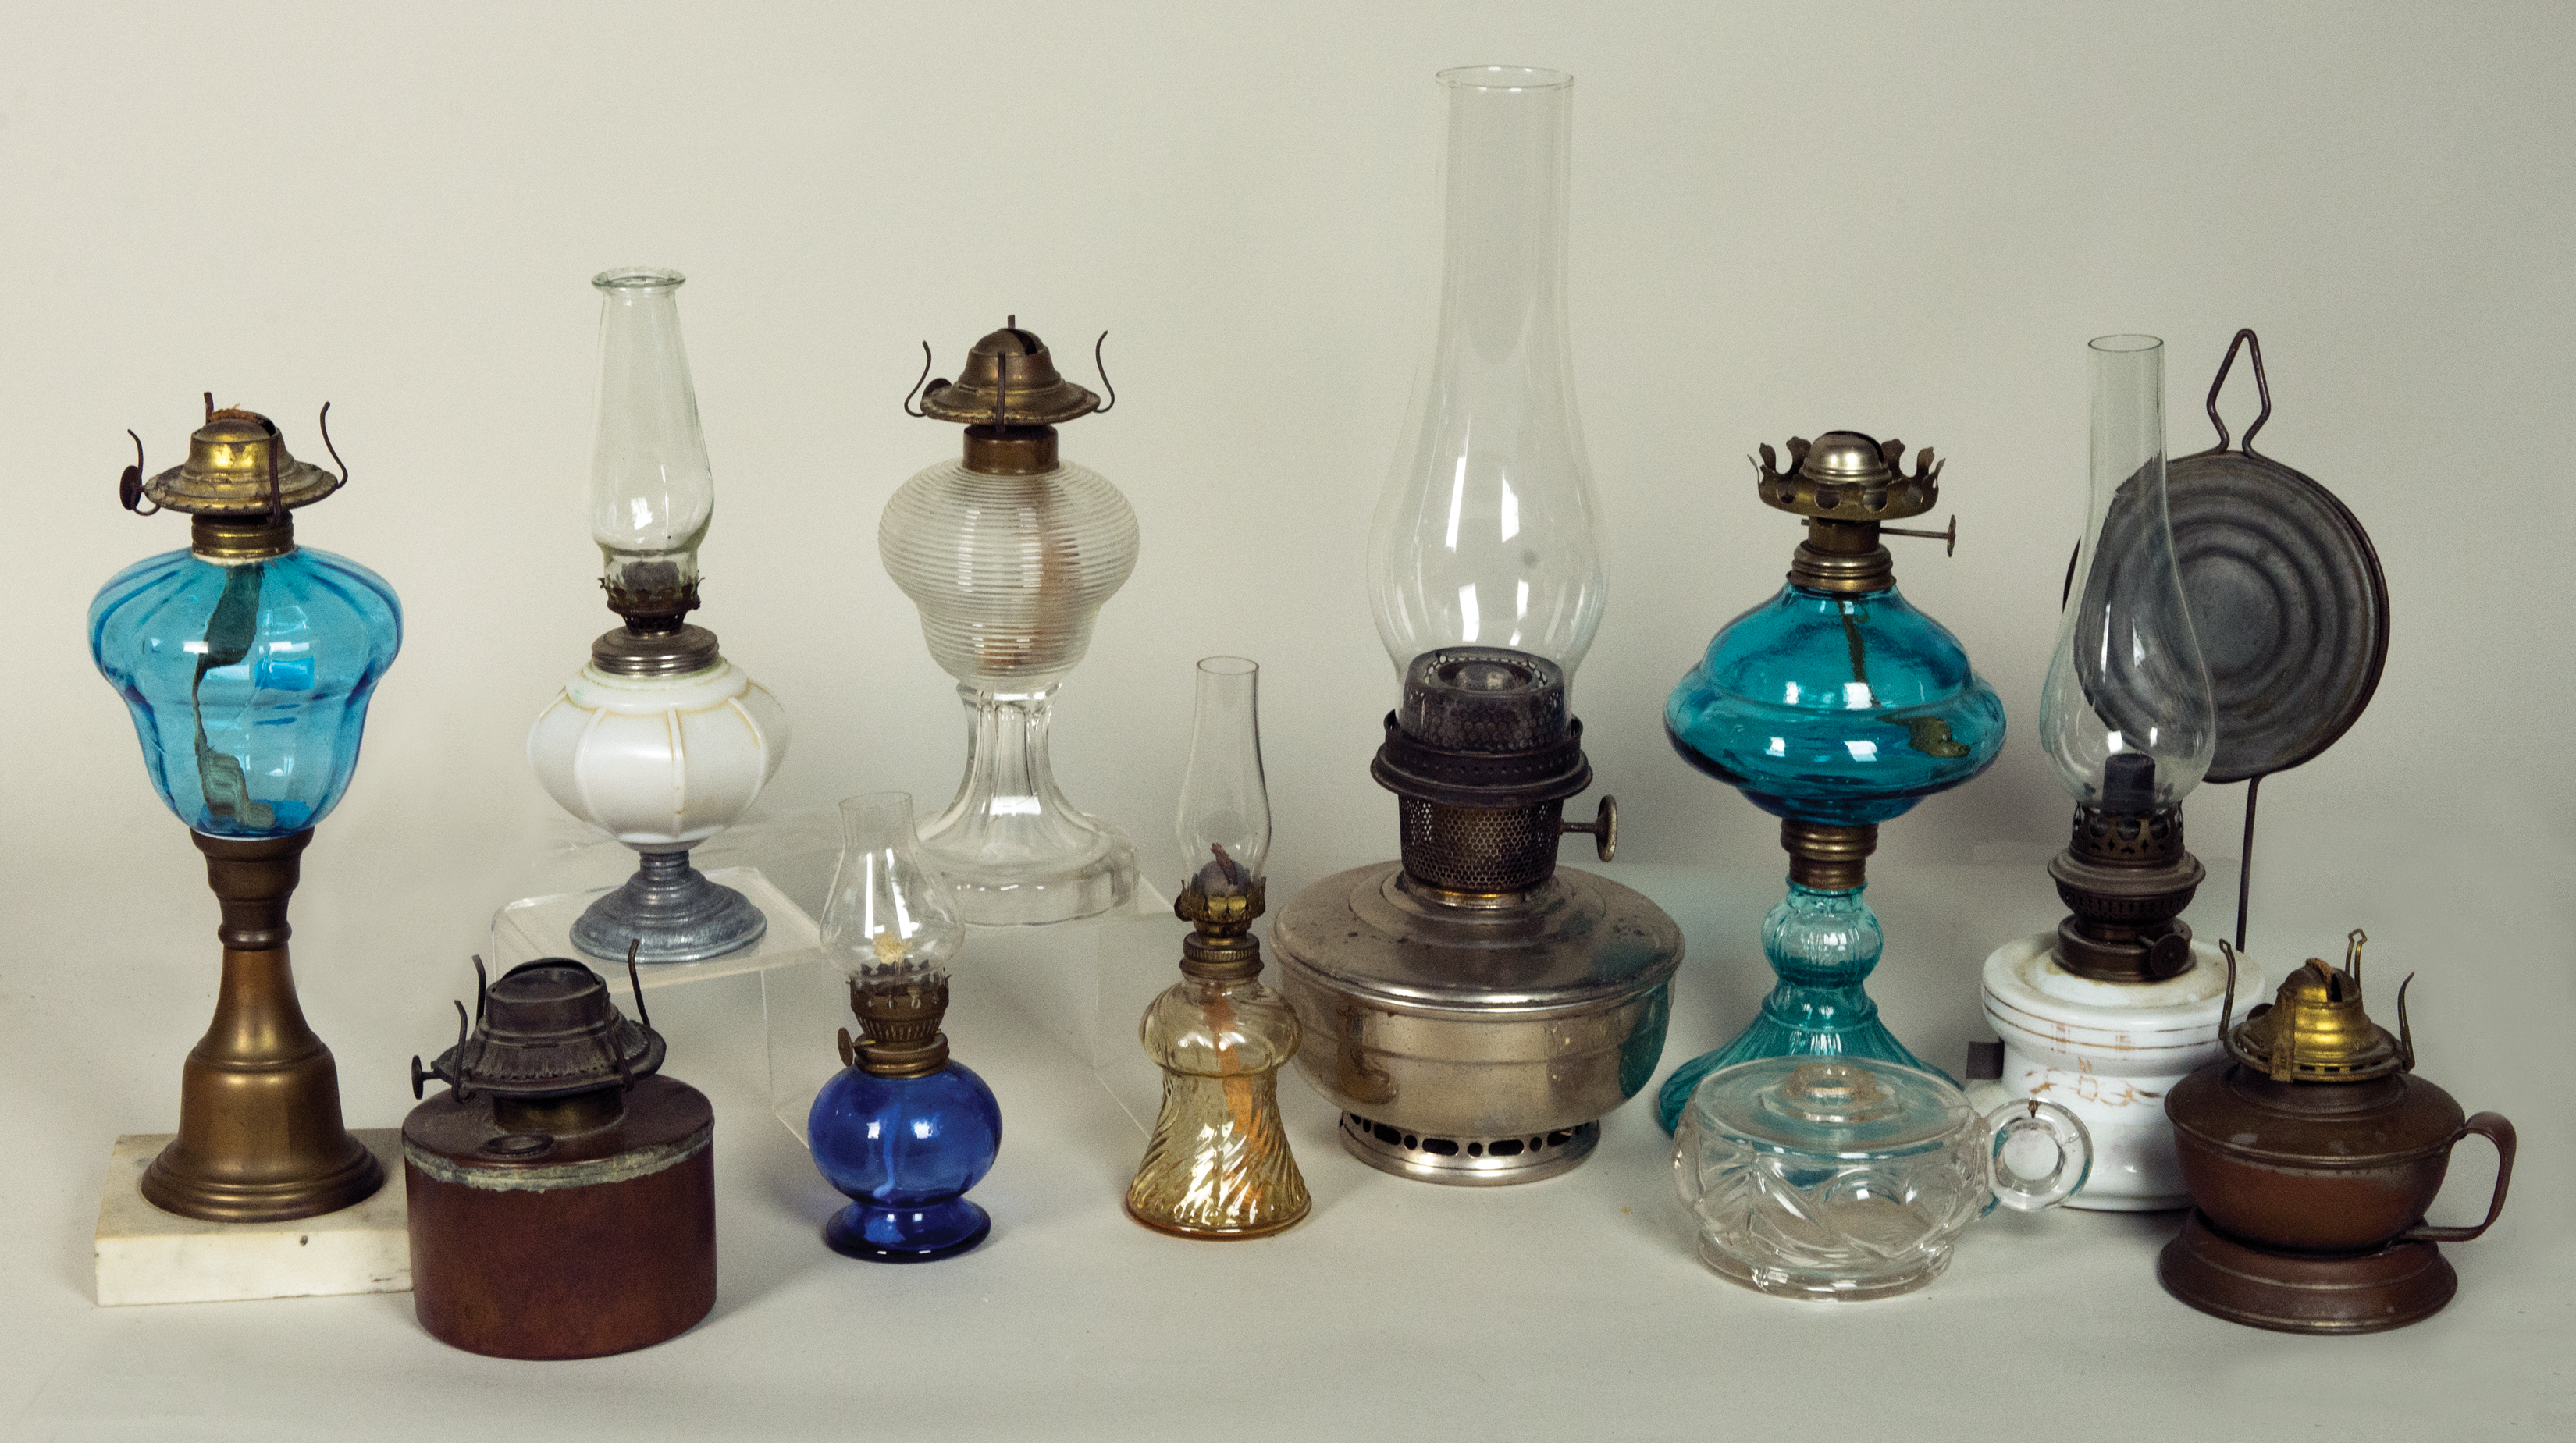 glass, oil, lamps, brass